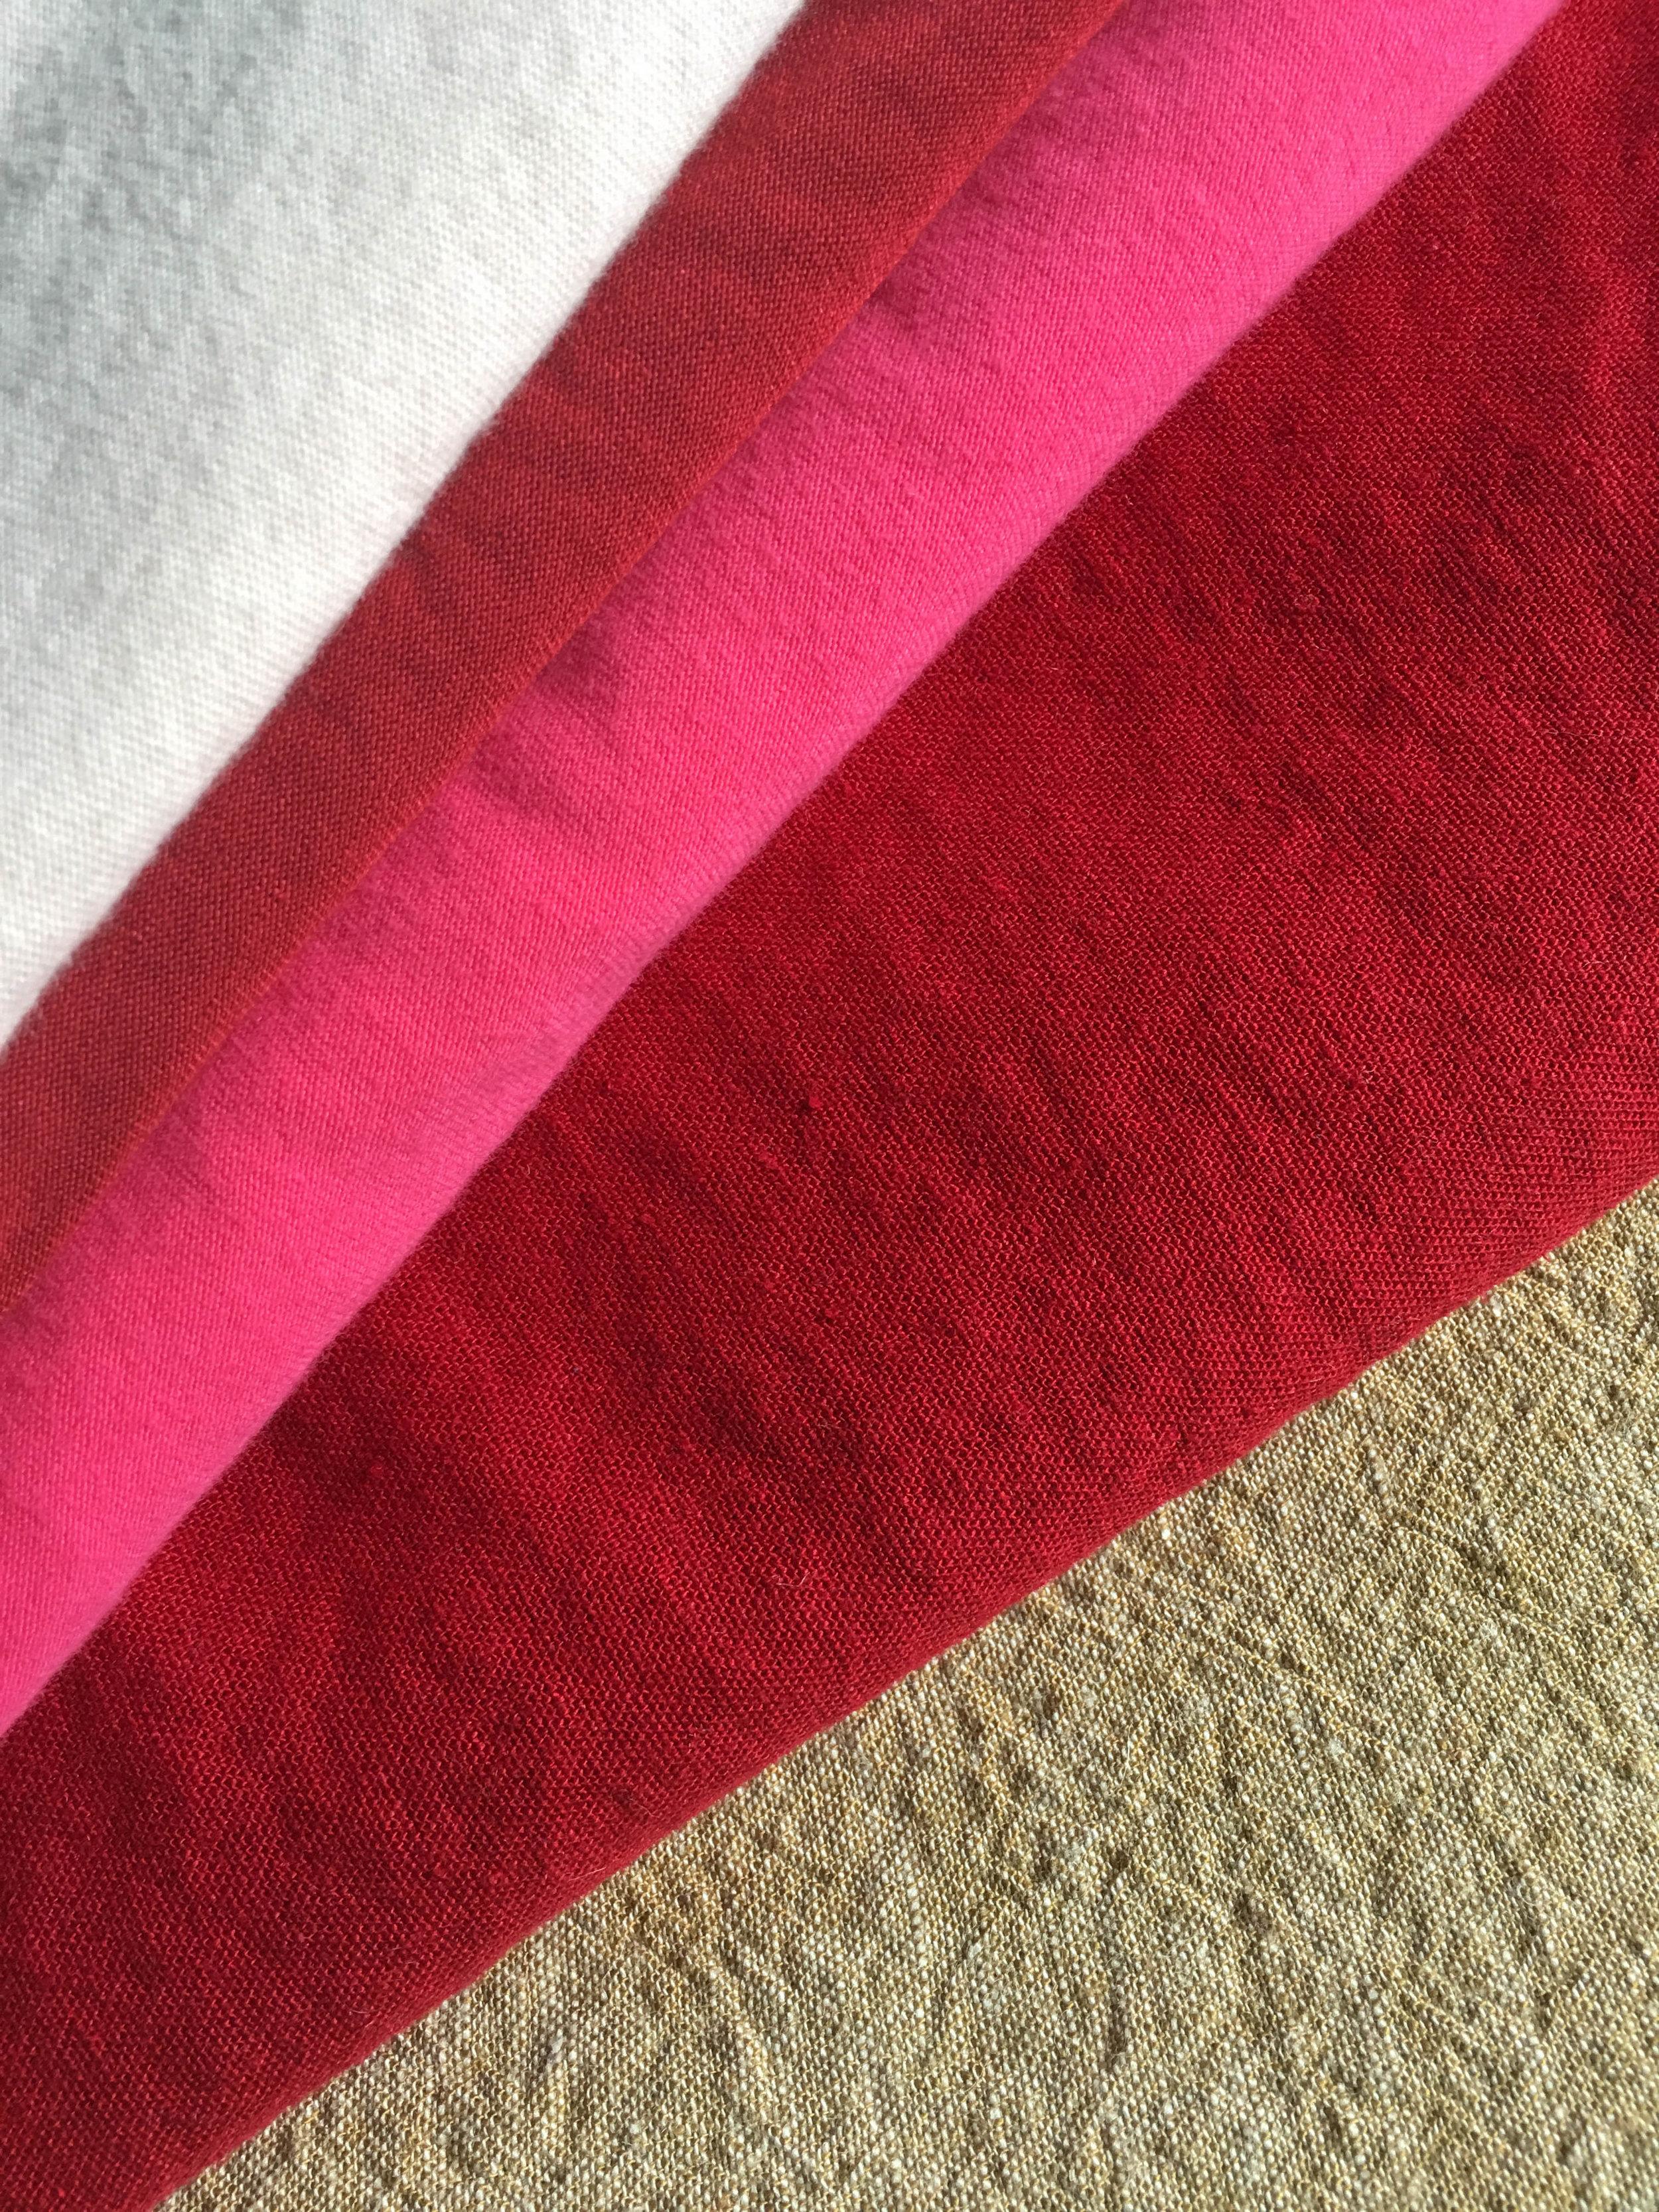 Warm summer fabric palette (1 of 1).jpg